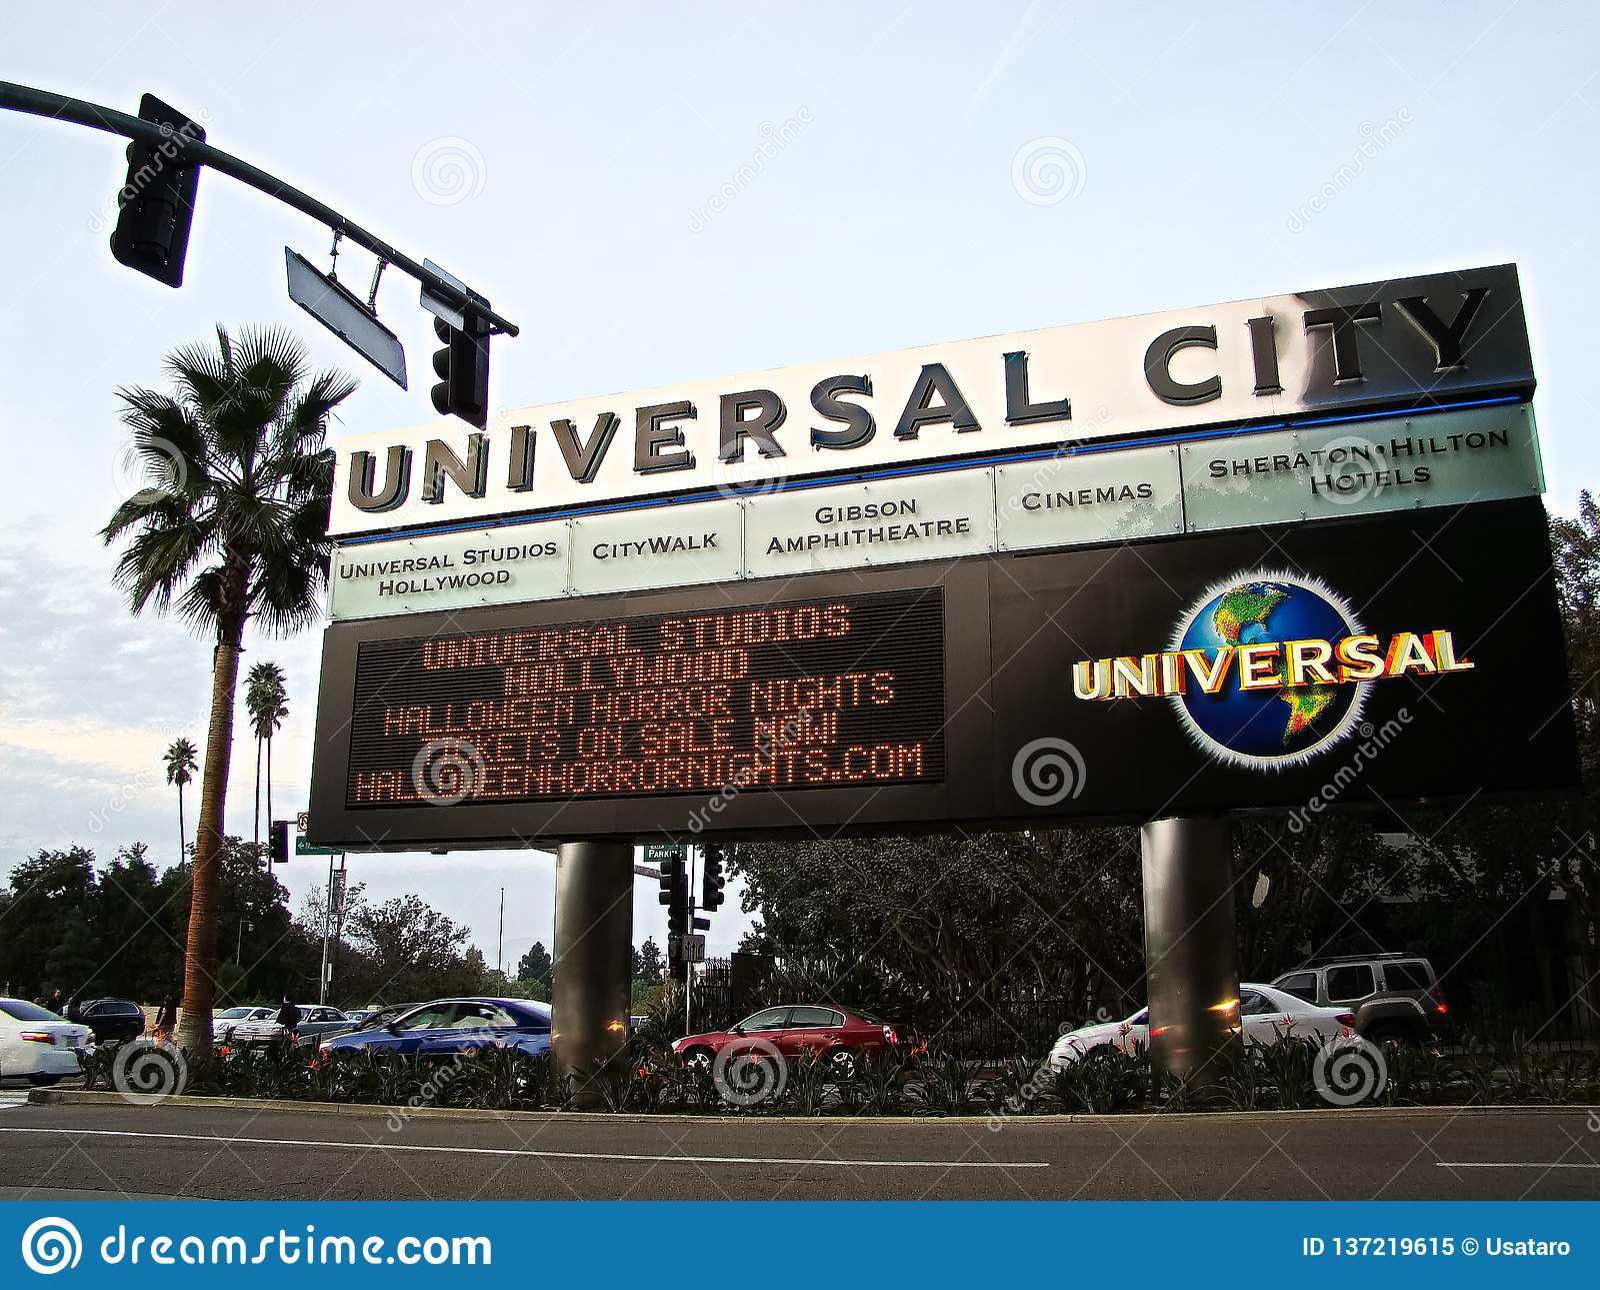 HALLOWEEN HORROR NIGHTS led advertising sign